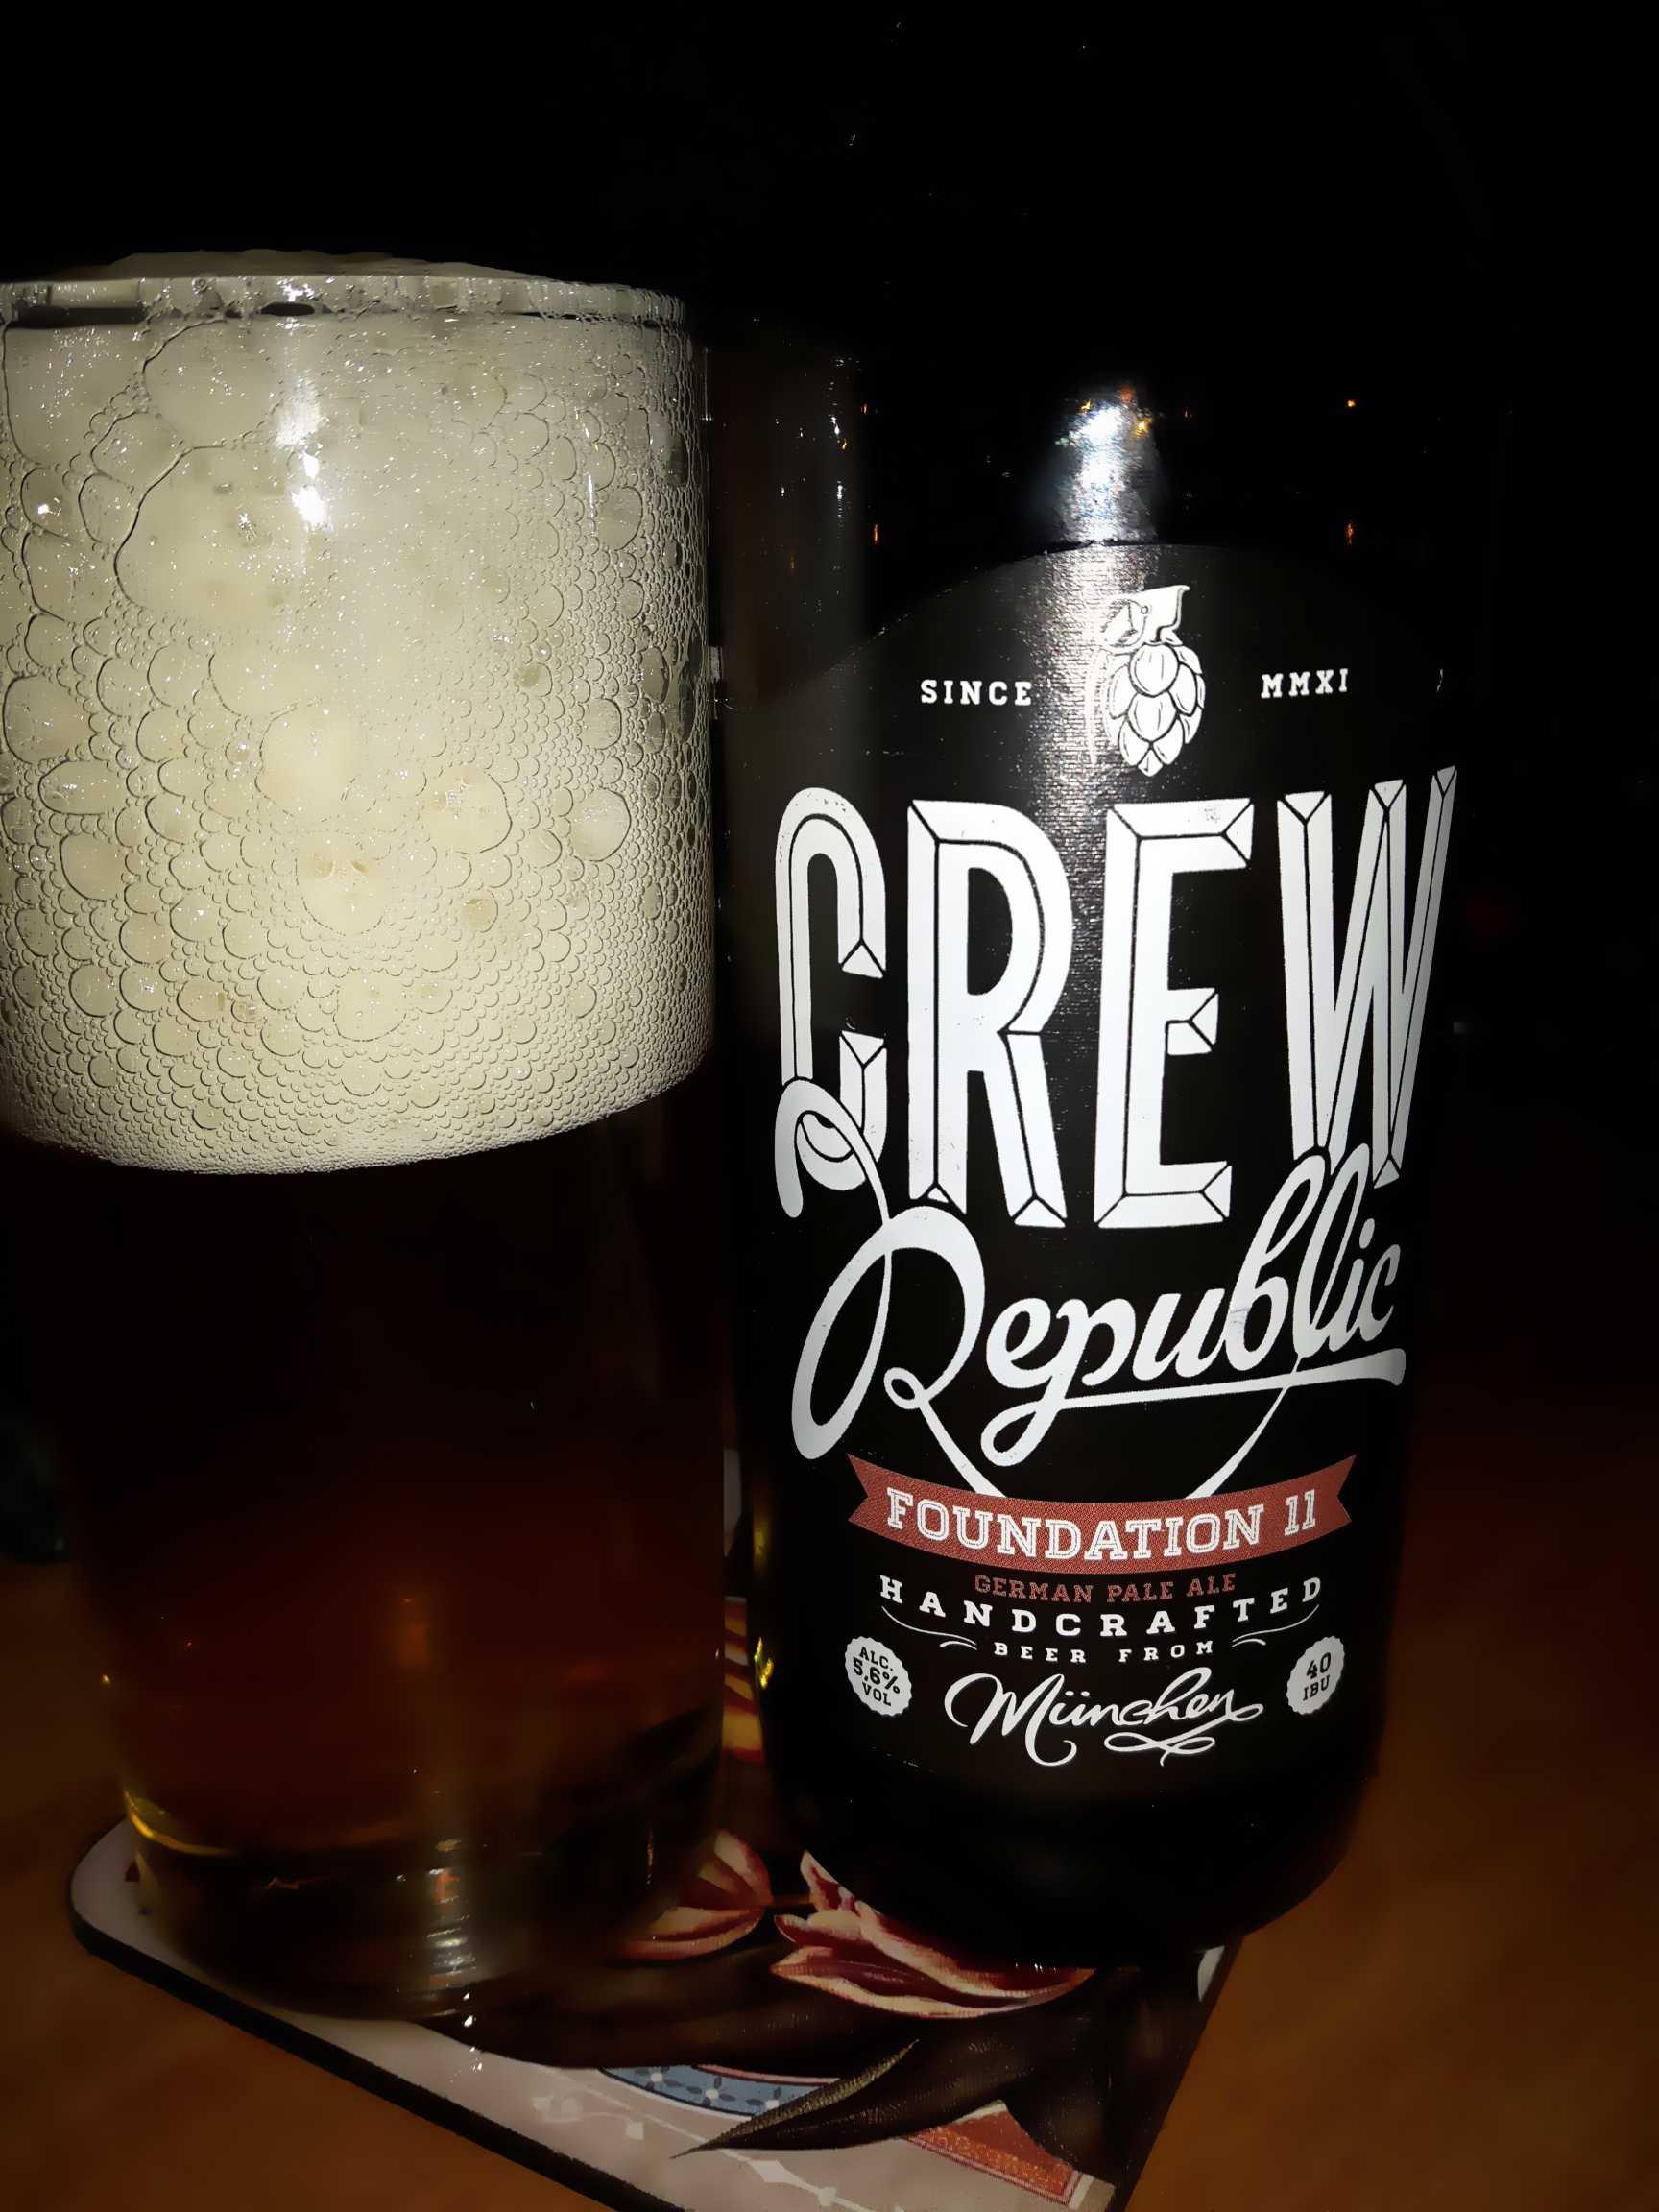 CrewRepublic_Foundation11